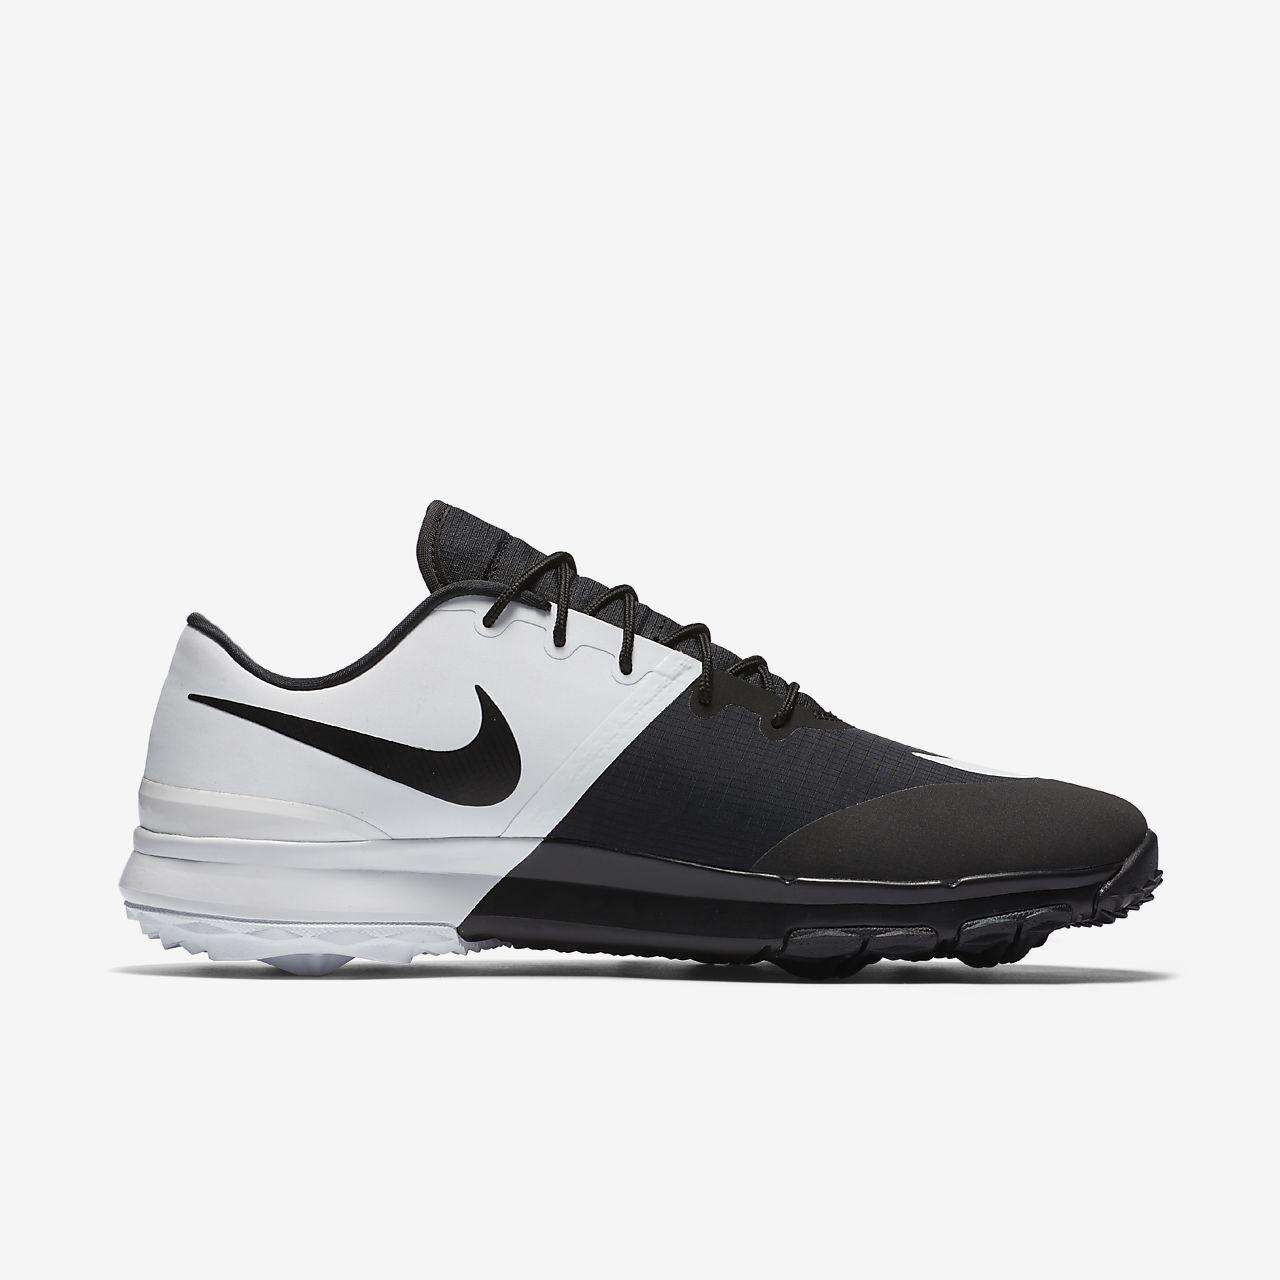 Nike FI Flex Wide Mens Golf Shoe